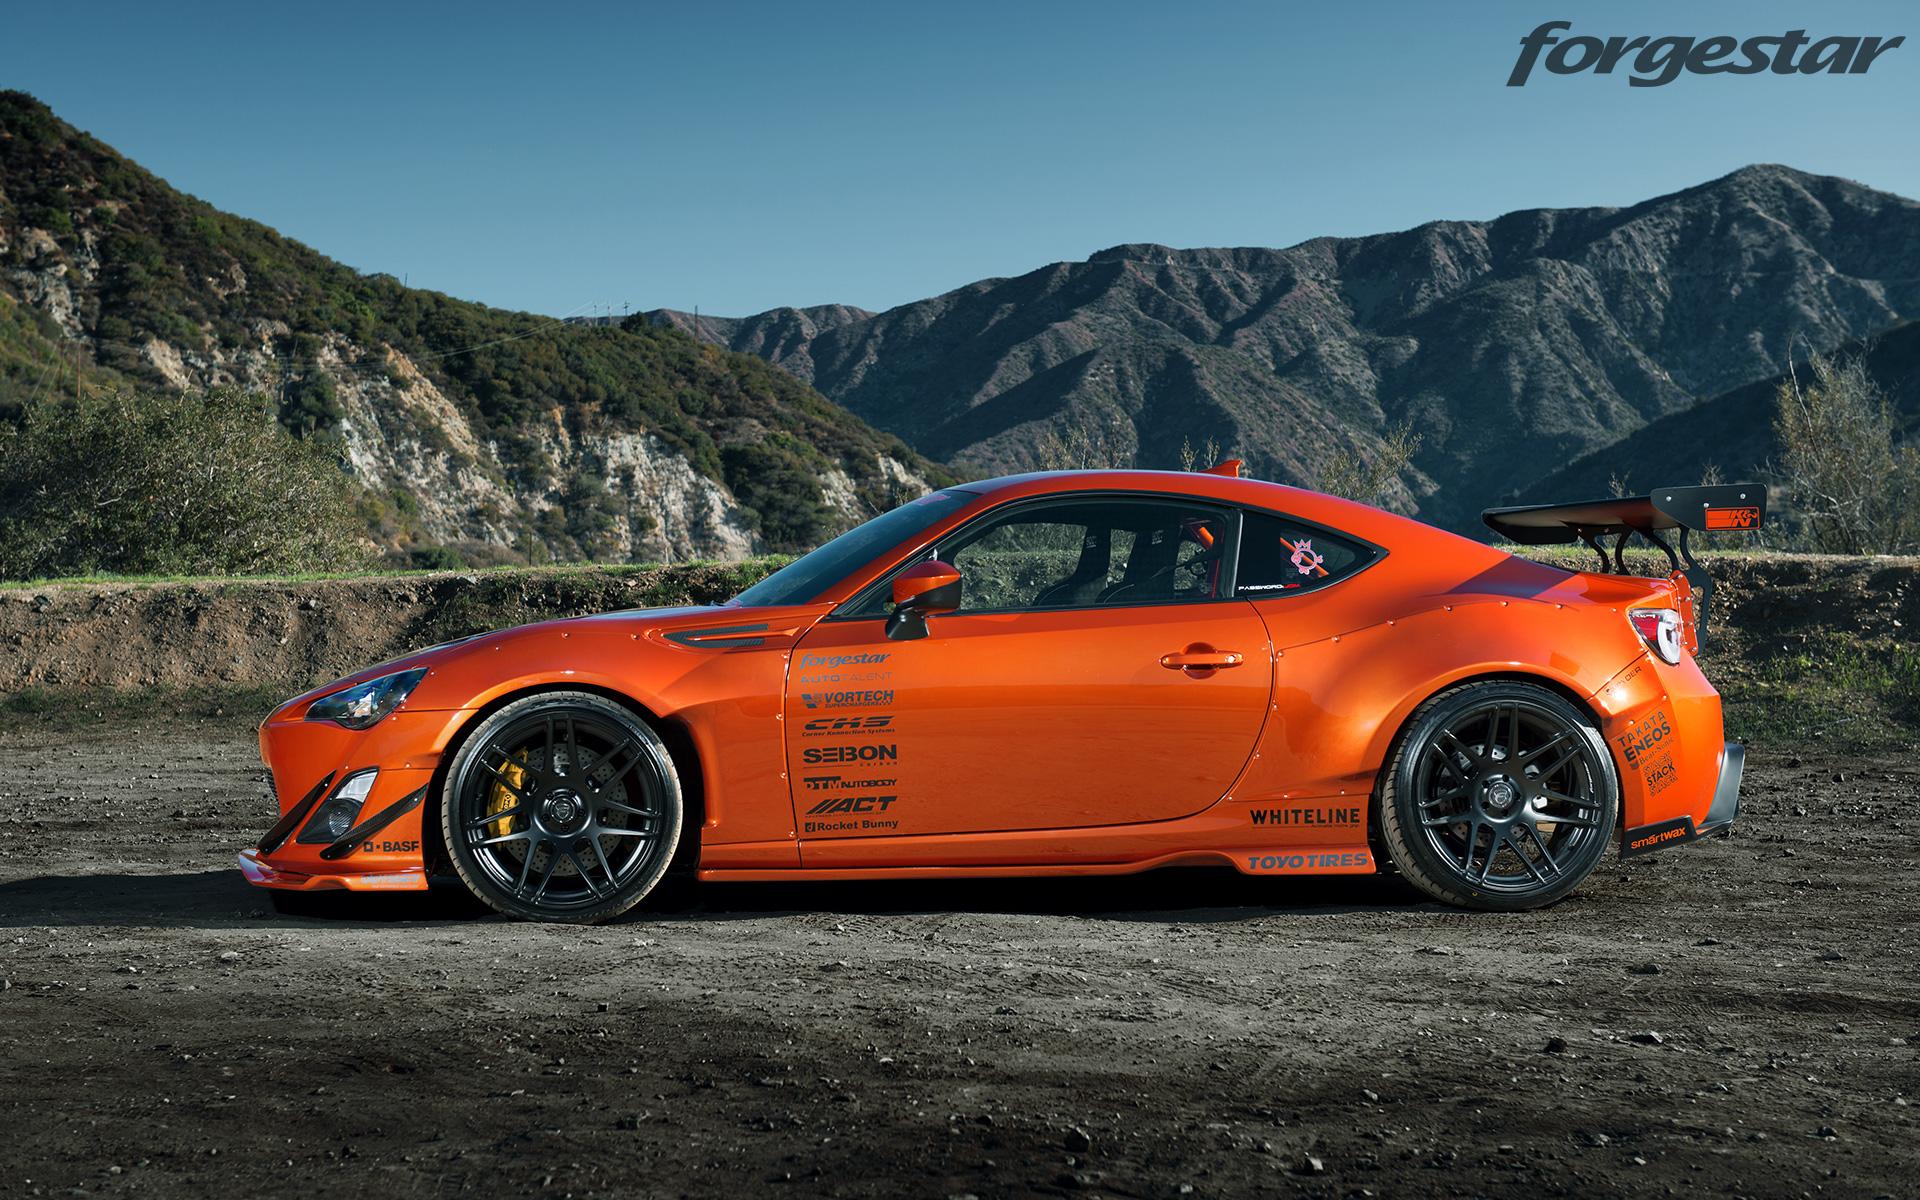 Forgestar 18x95 18x11 Gloss Black F14 Wheels For Rocket Bunny Scion FR S Subaru BRZ